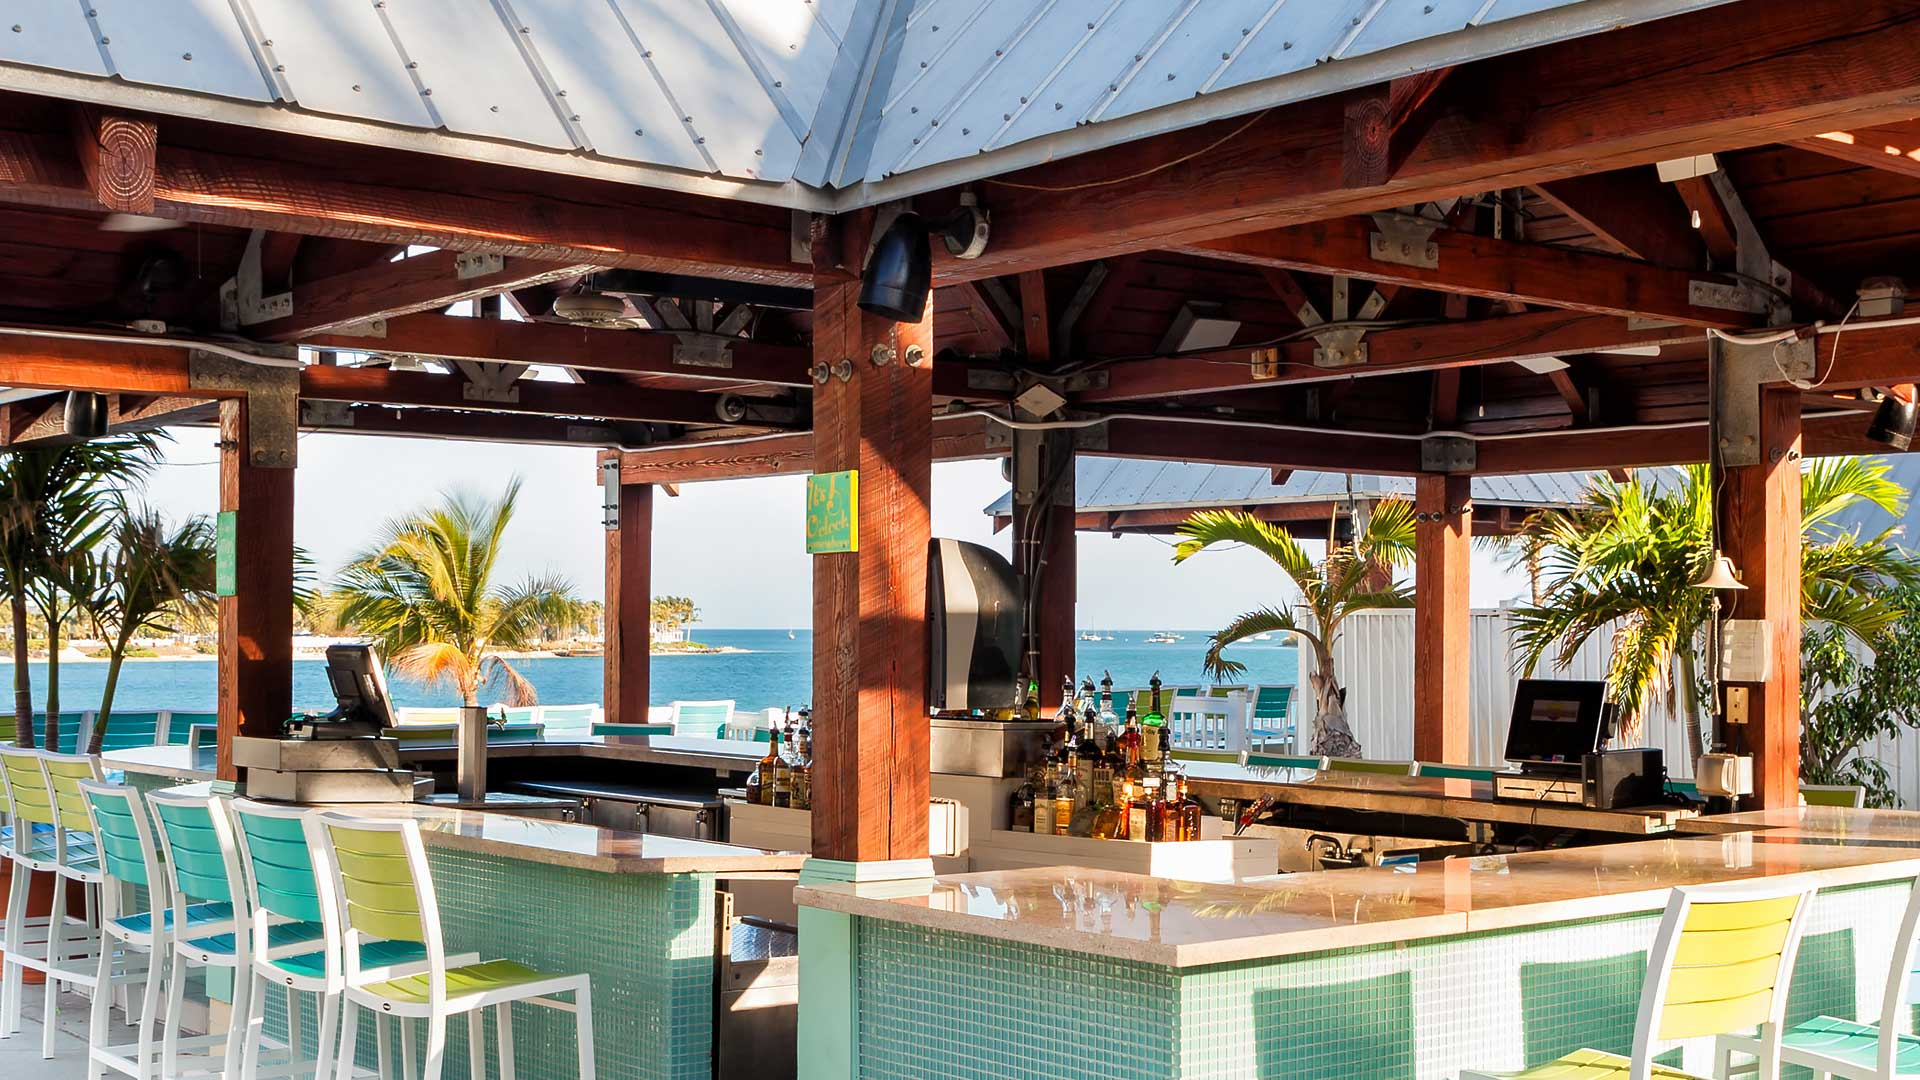 Sunset Deck Dining & Entertainment at Margaritaville Key West